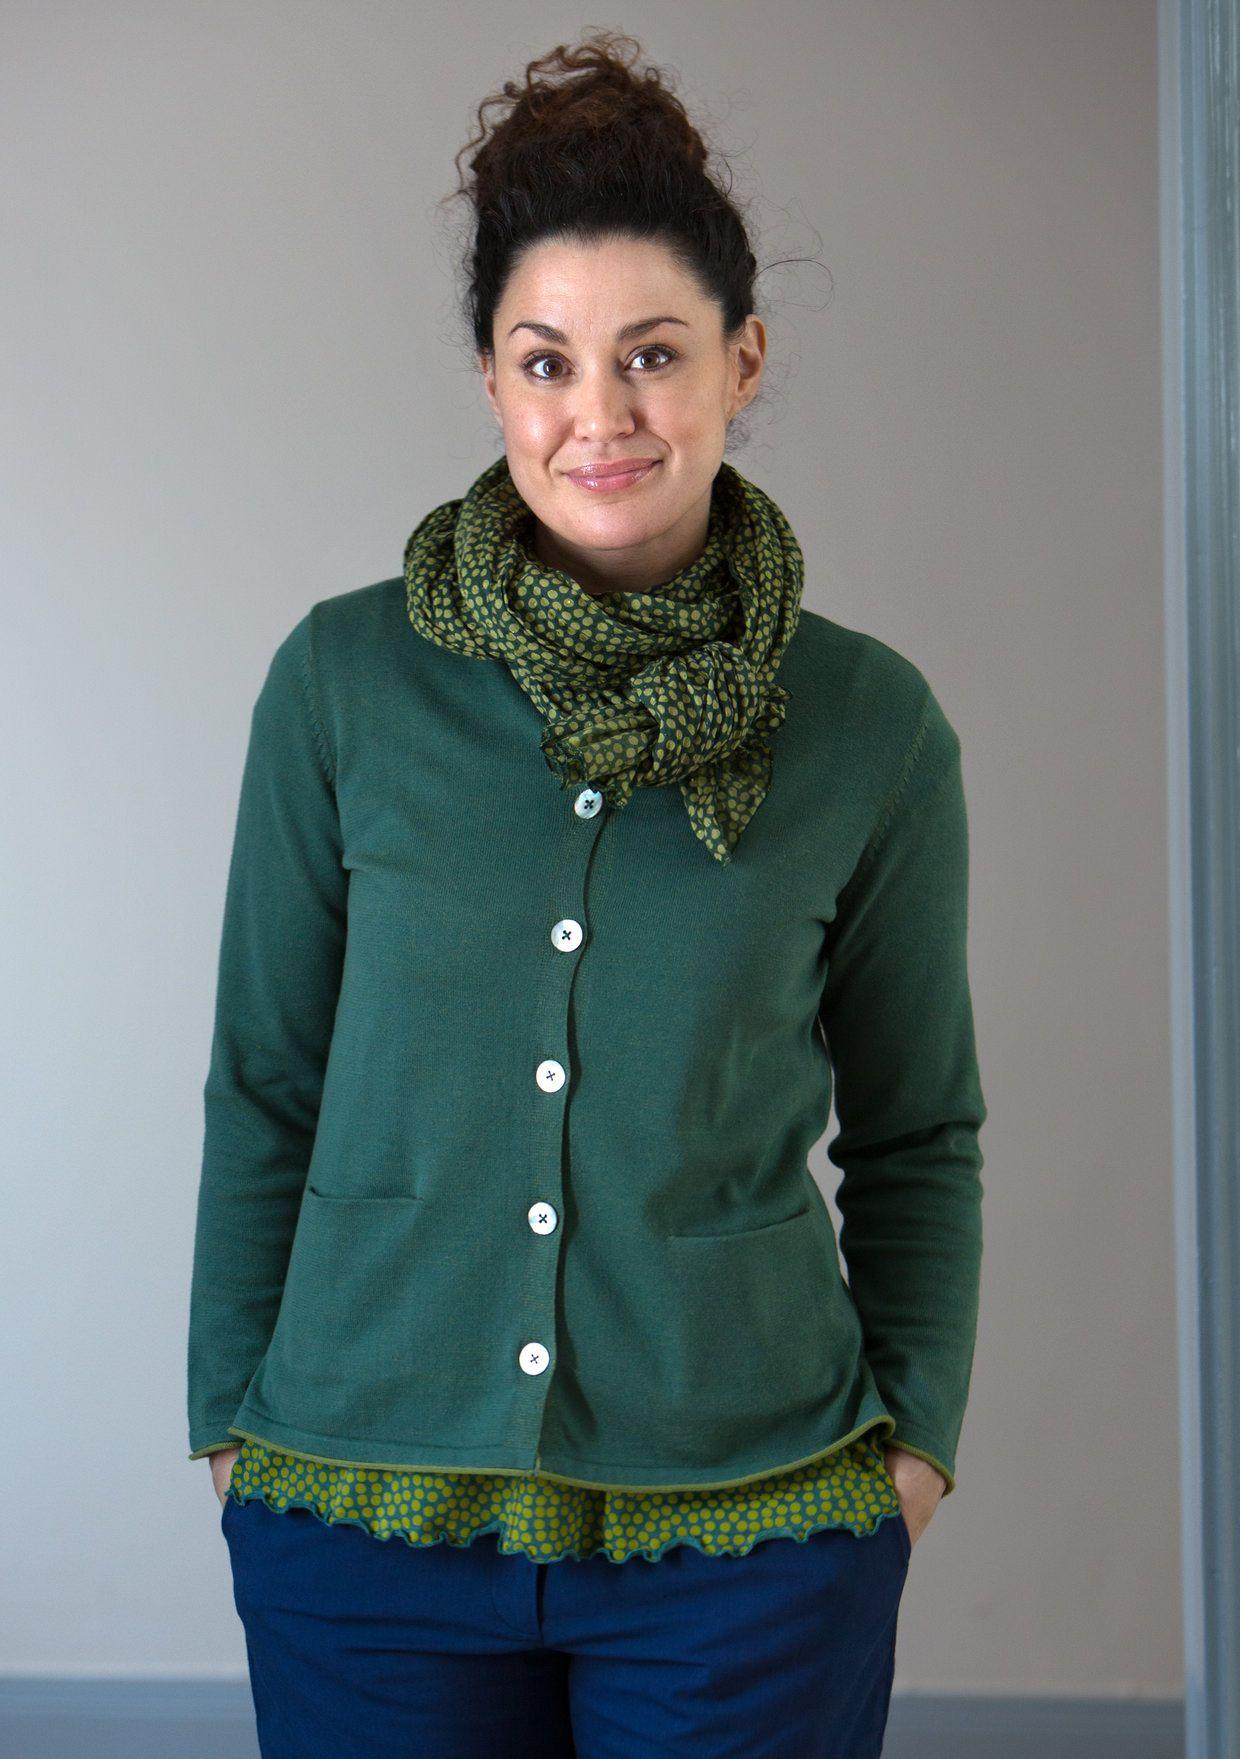 cf5ca4790fc6 Plaited knit cardigan in eco-cotton – Sweaters & cardigans – GUDRUN SJÖDÉN  – Webshop